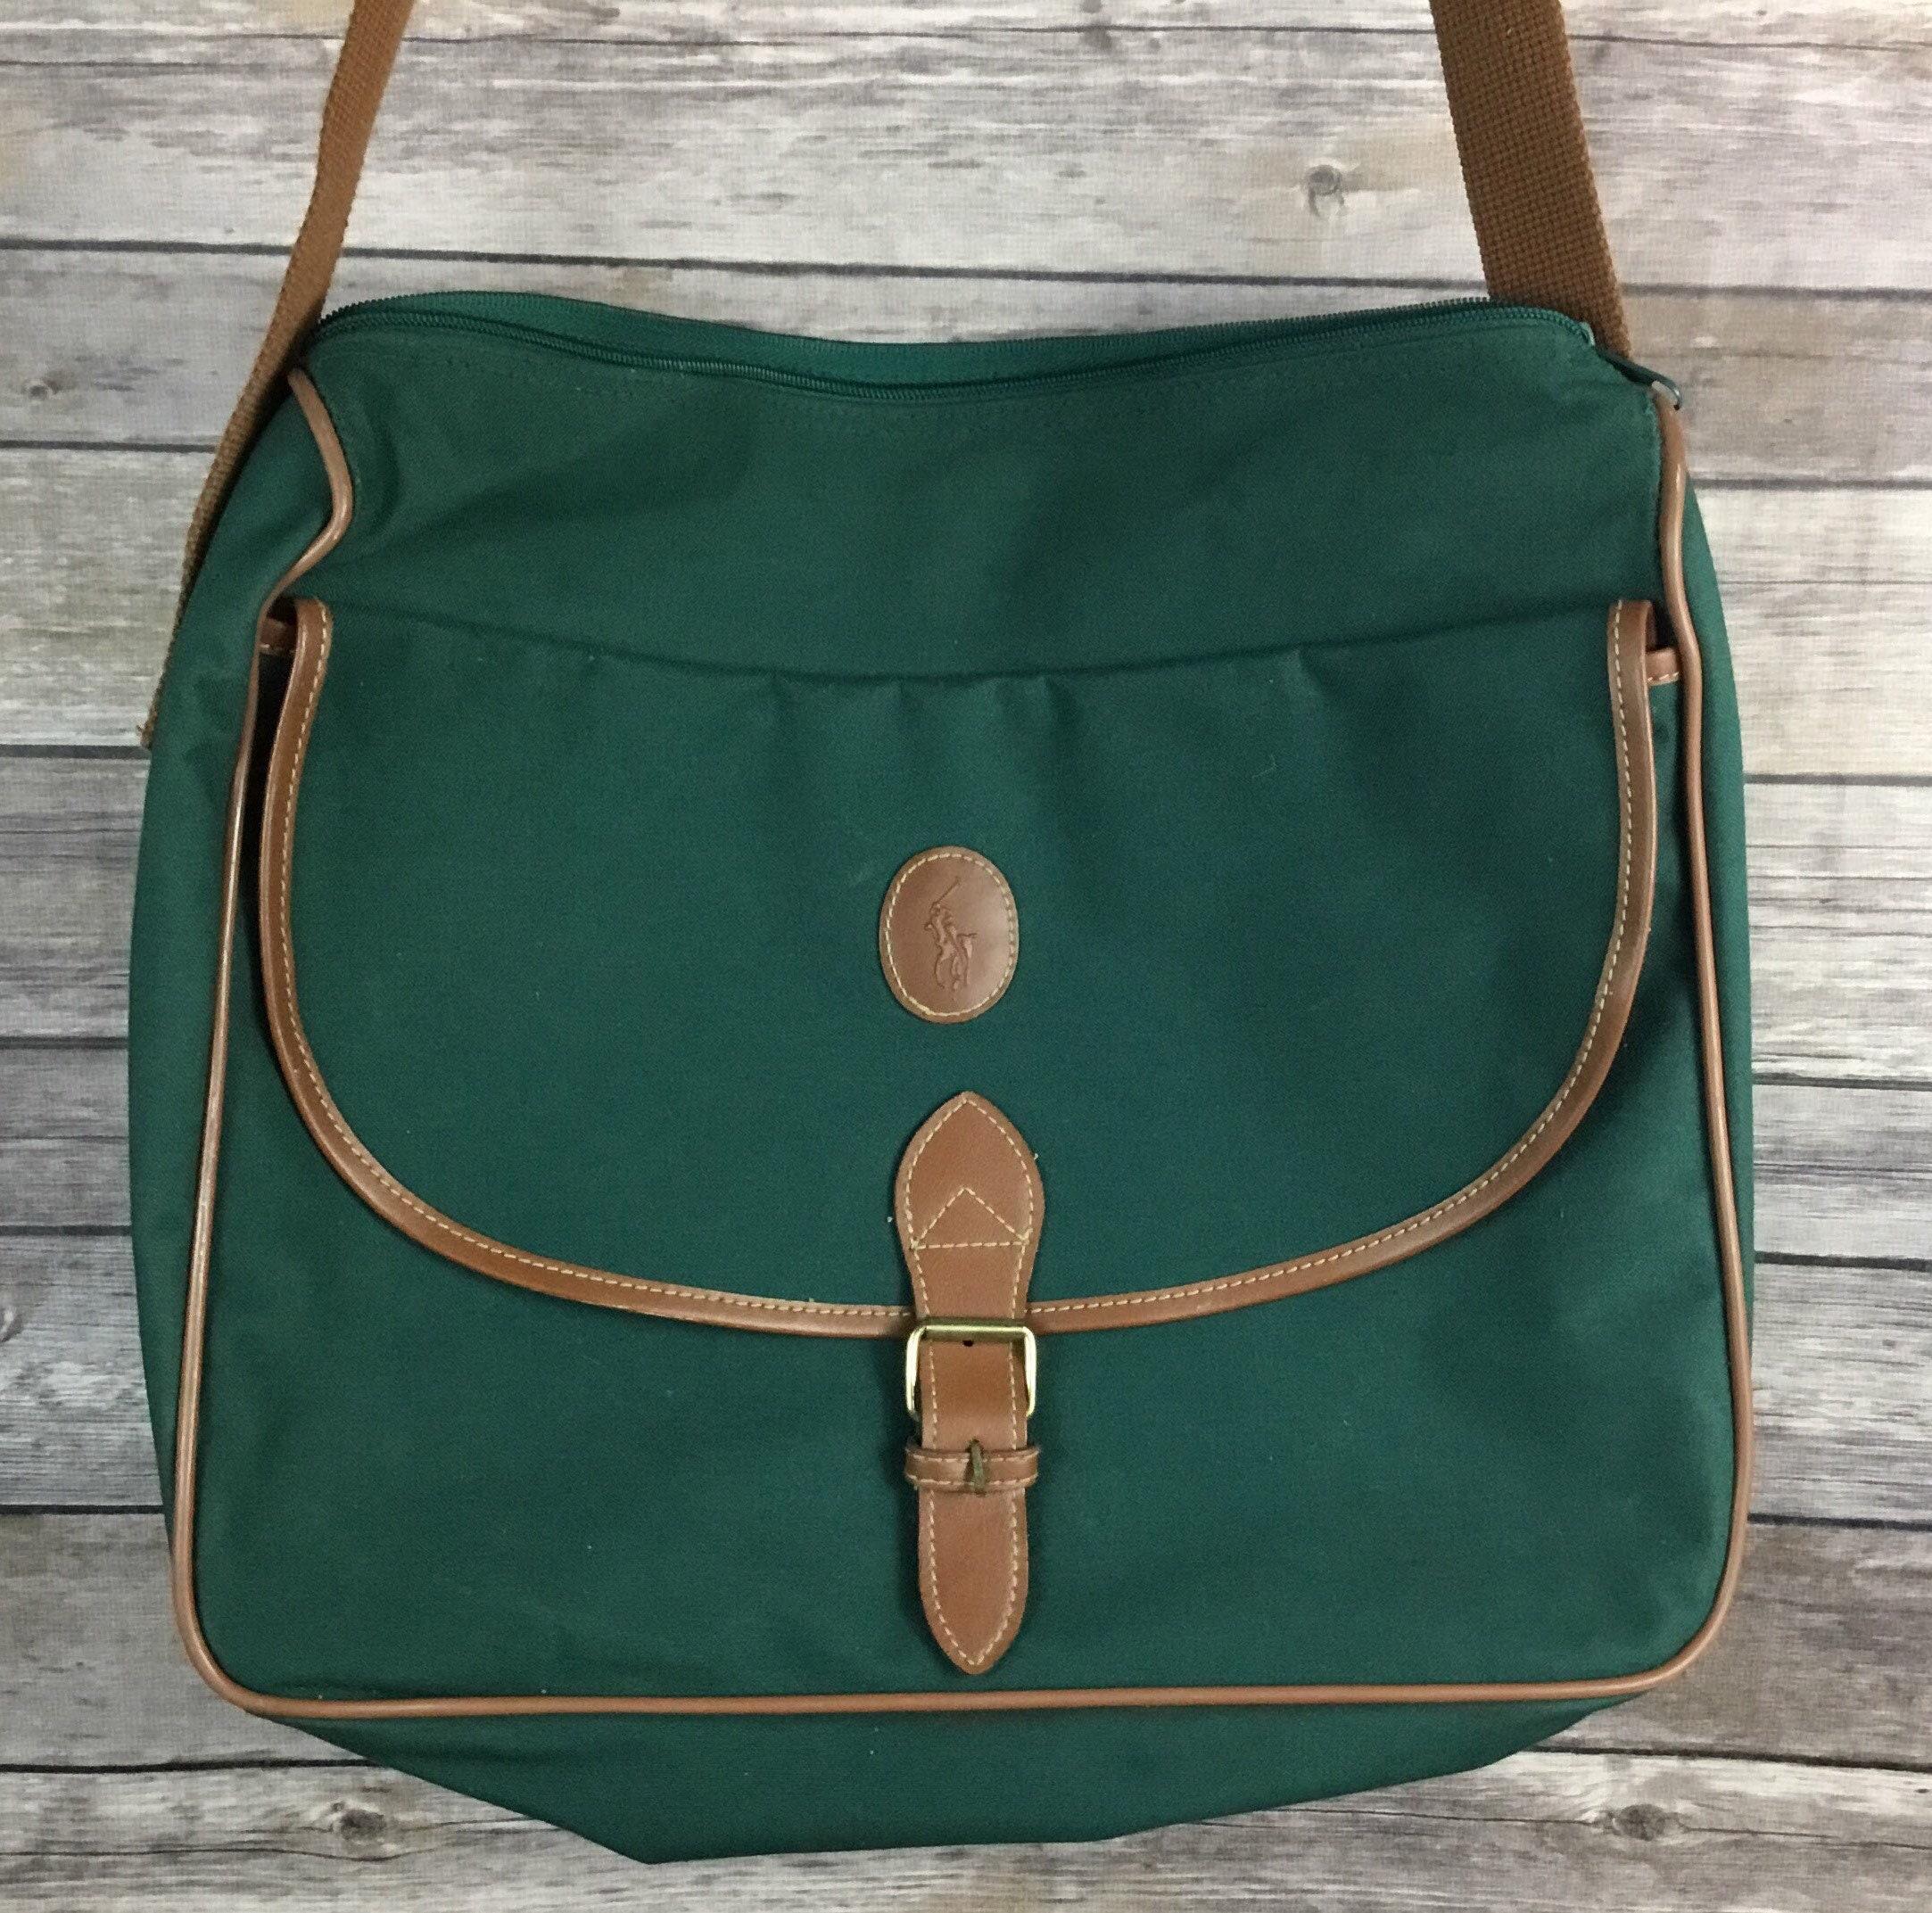 f5308402f39 ... free shipping description. vintage polo ralph lauren classic green tan  messenger bag 95459 21ee6